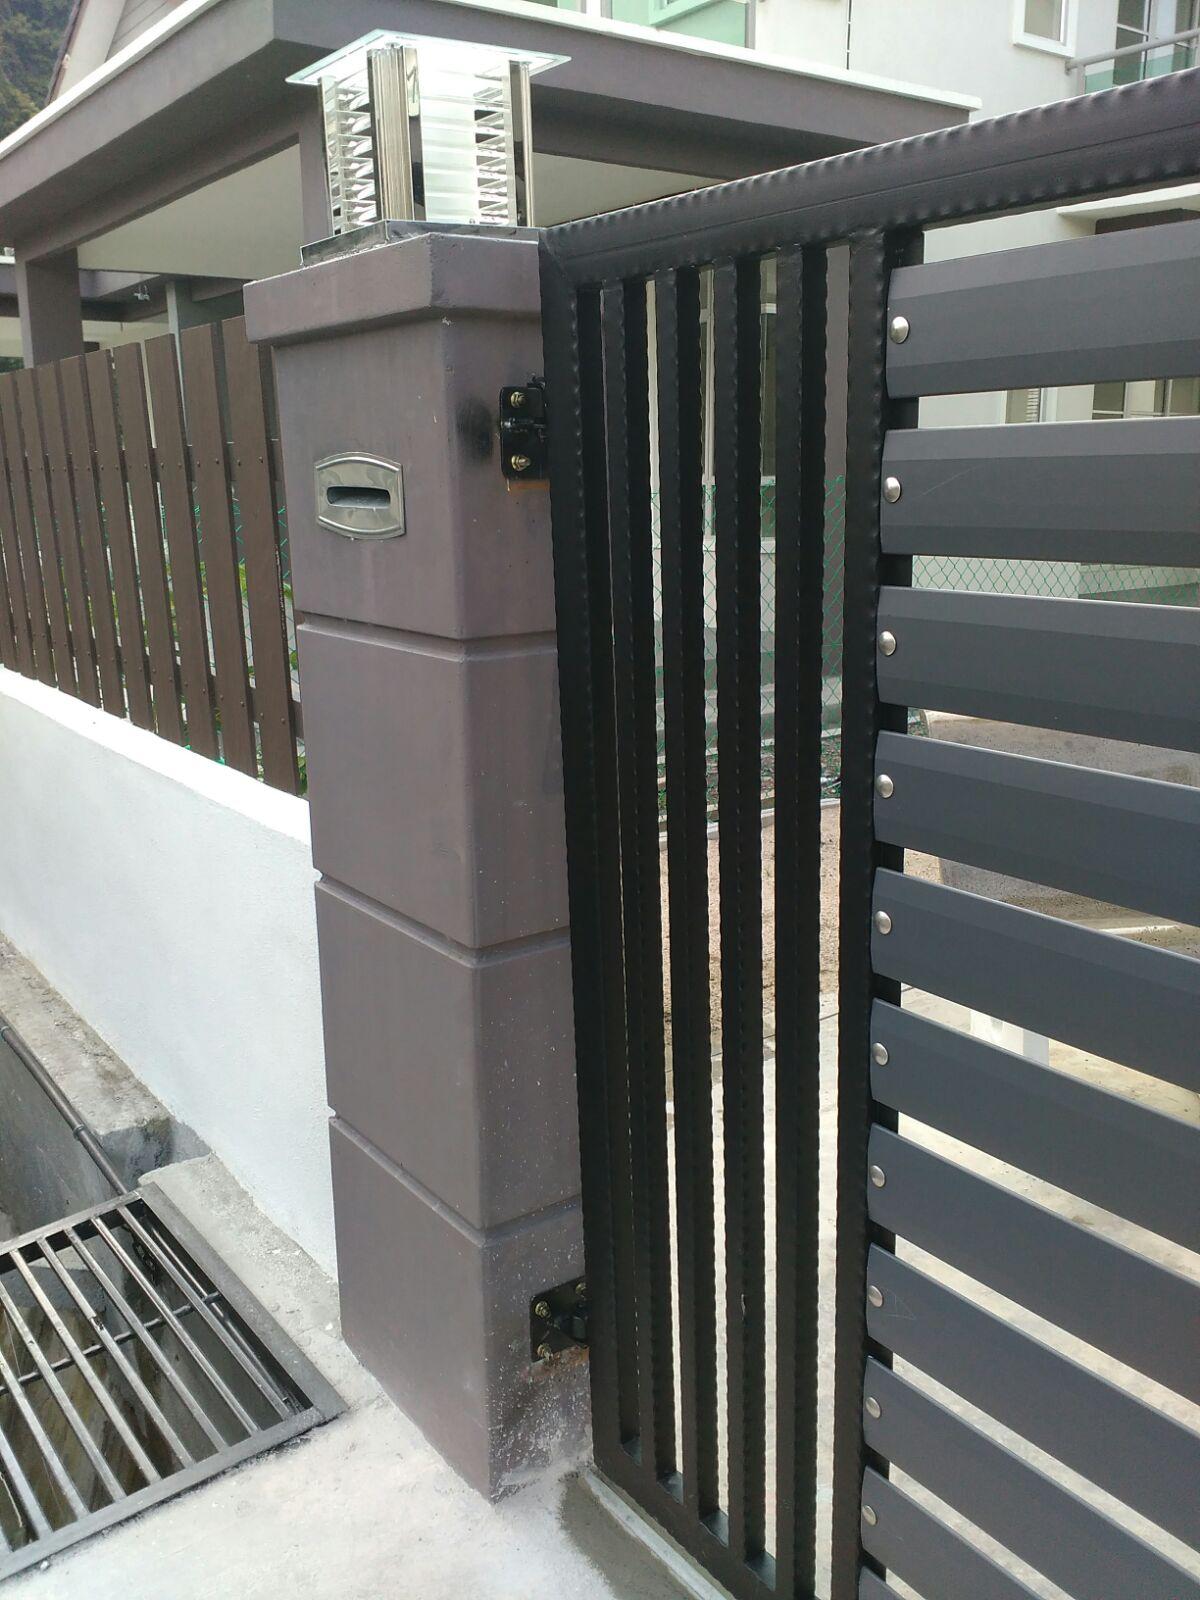 Jenis-Jenis Besi Untuk Membuat Pintu Pagar & Pintu Jeriji ...